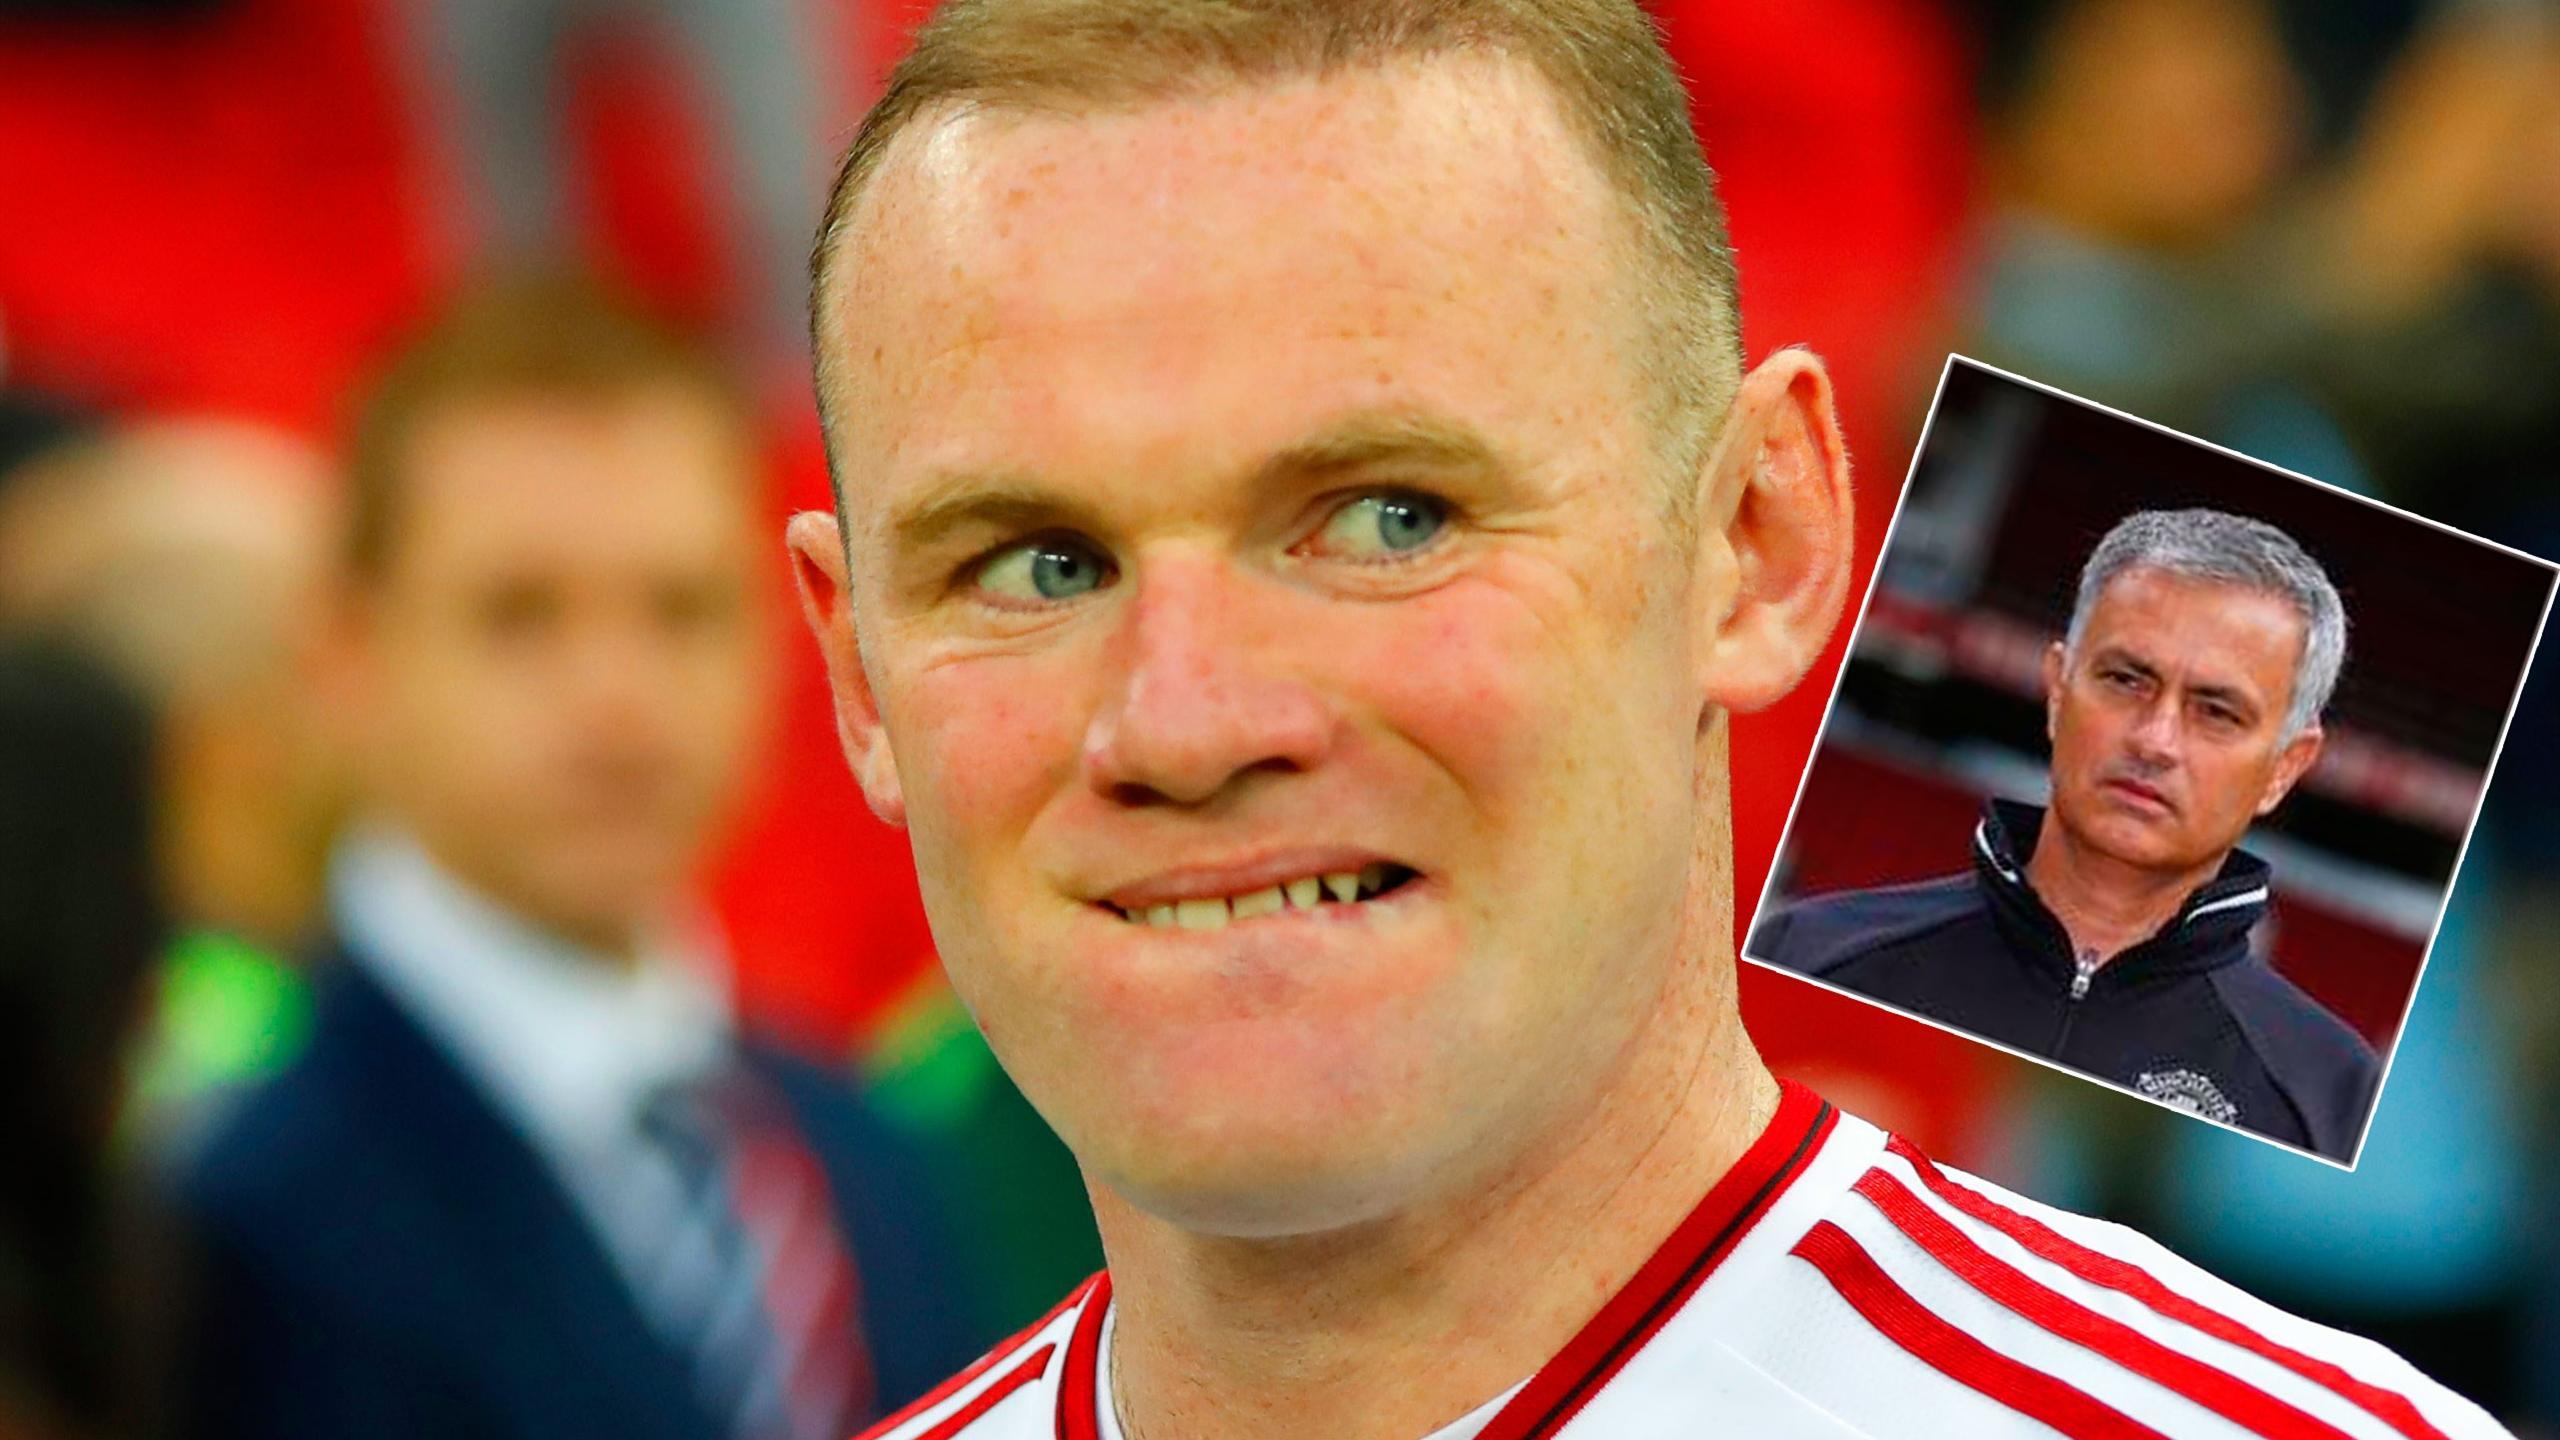 Jose Mourinho 'ends Wayne Rooney's midfield career'